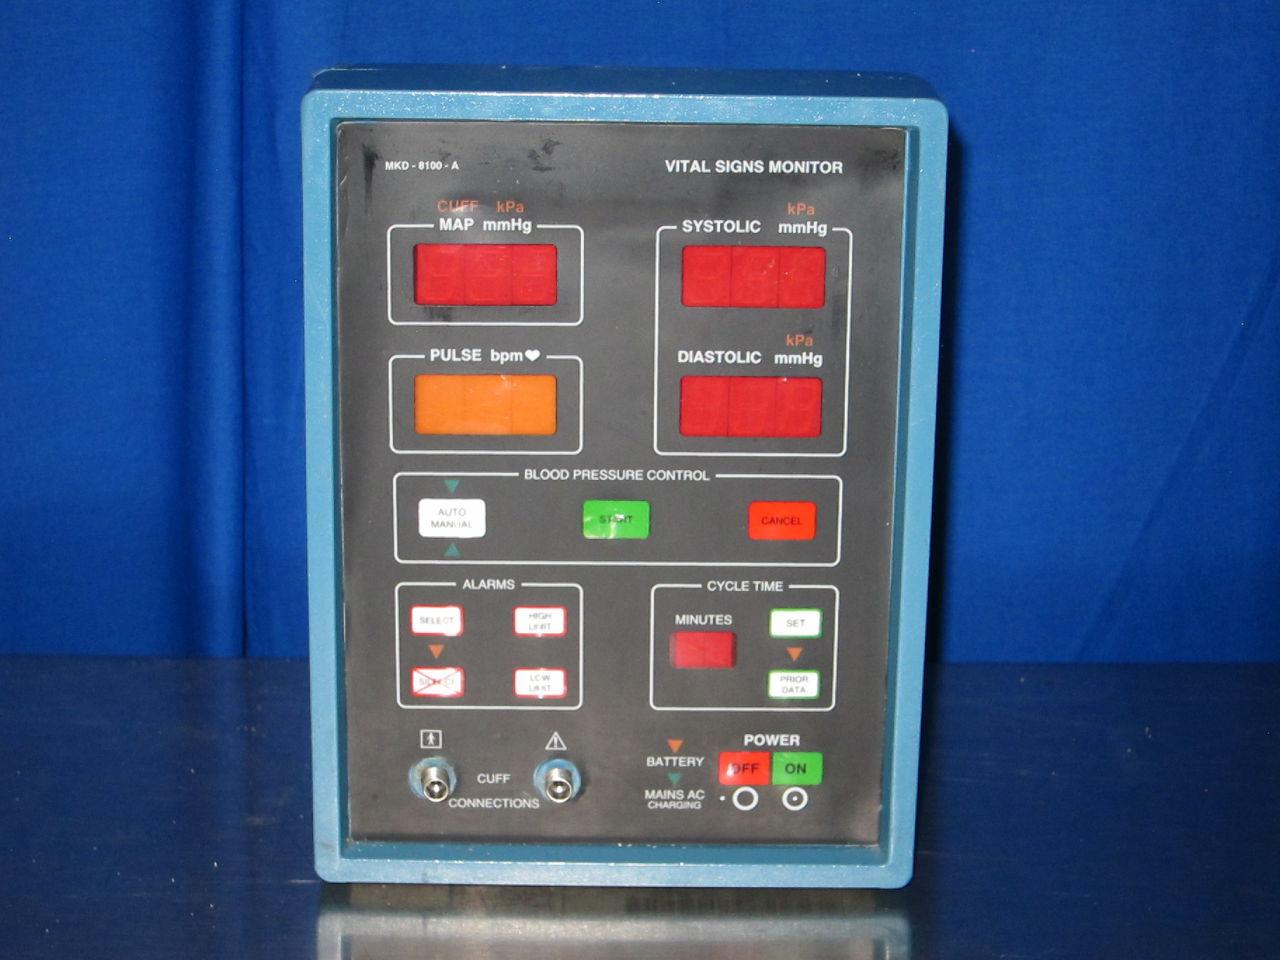 CRITIKON MKD-8100-A Monitor